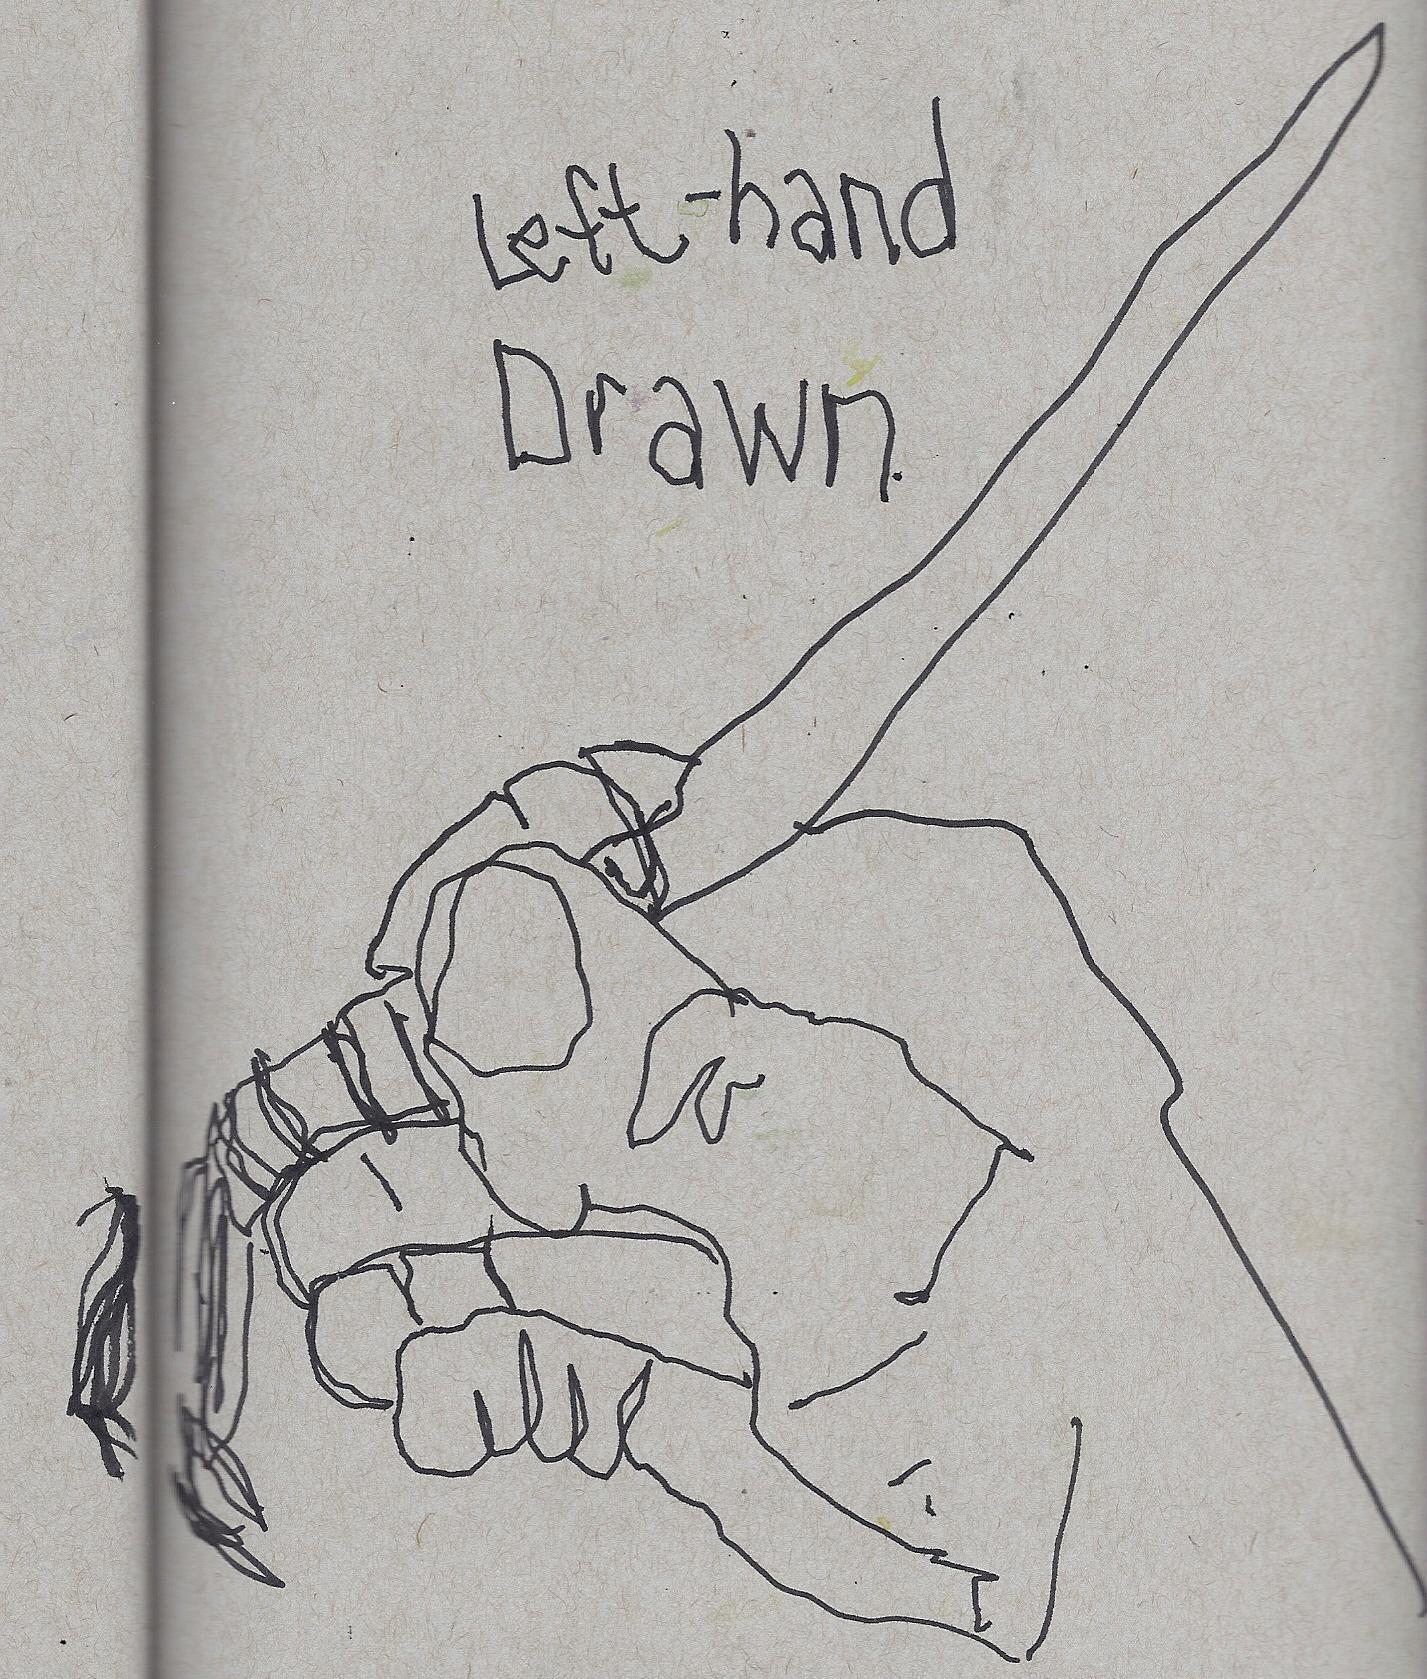 Demo of non-dominant hand